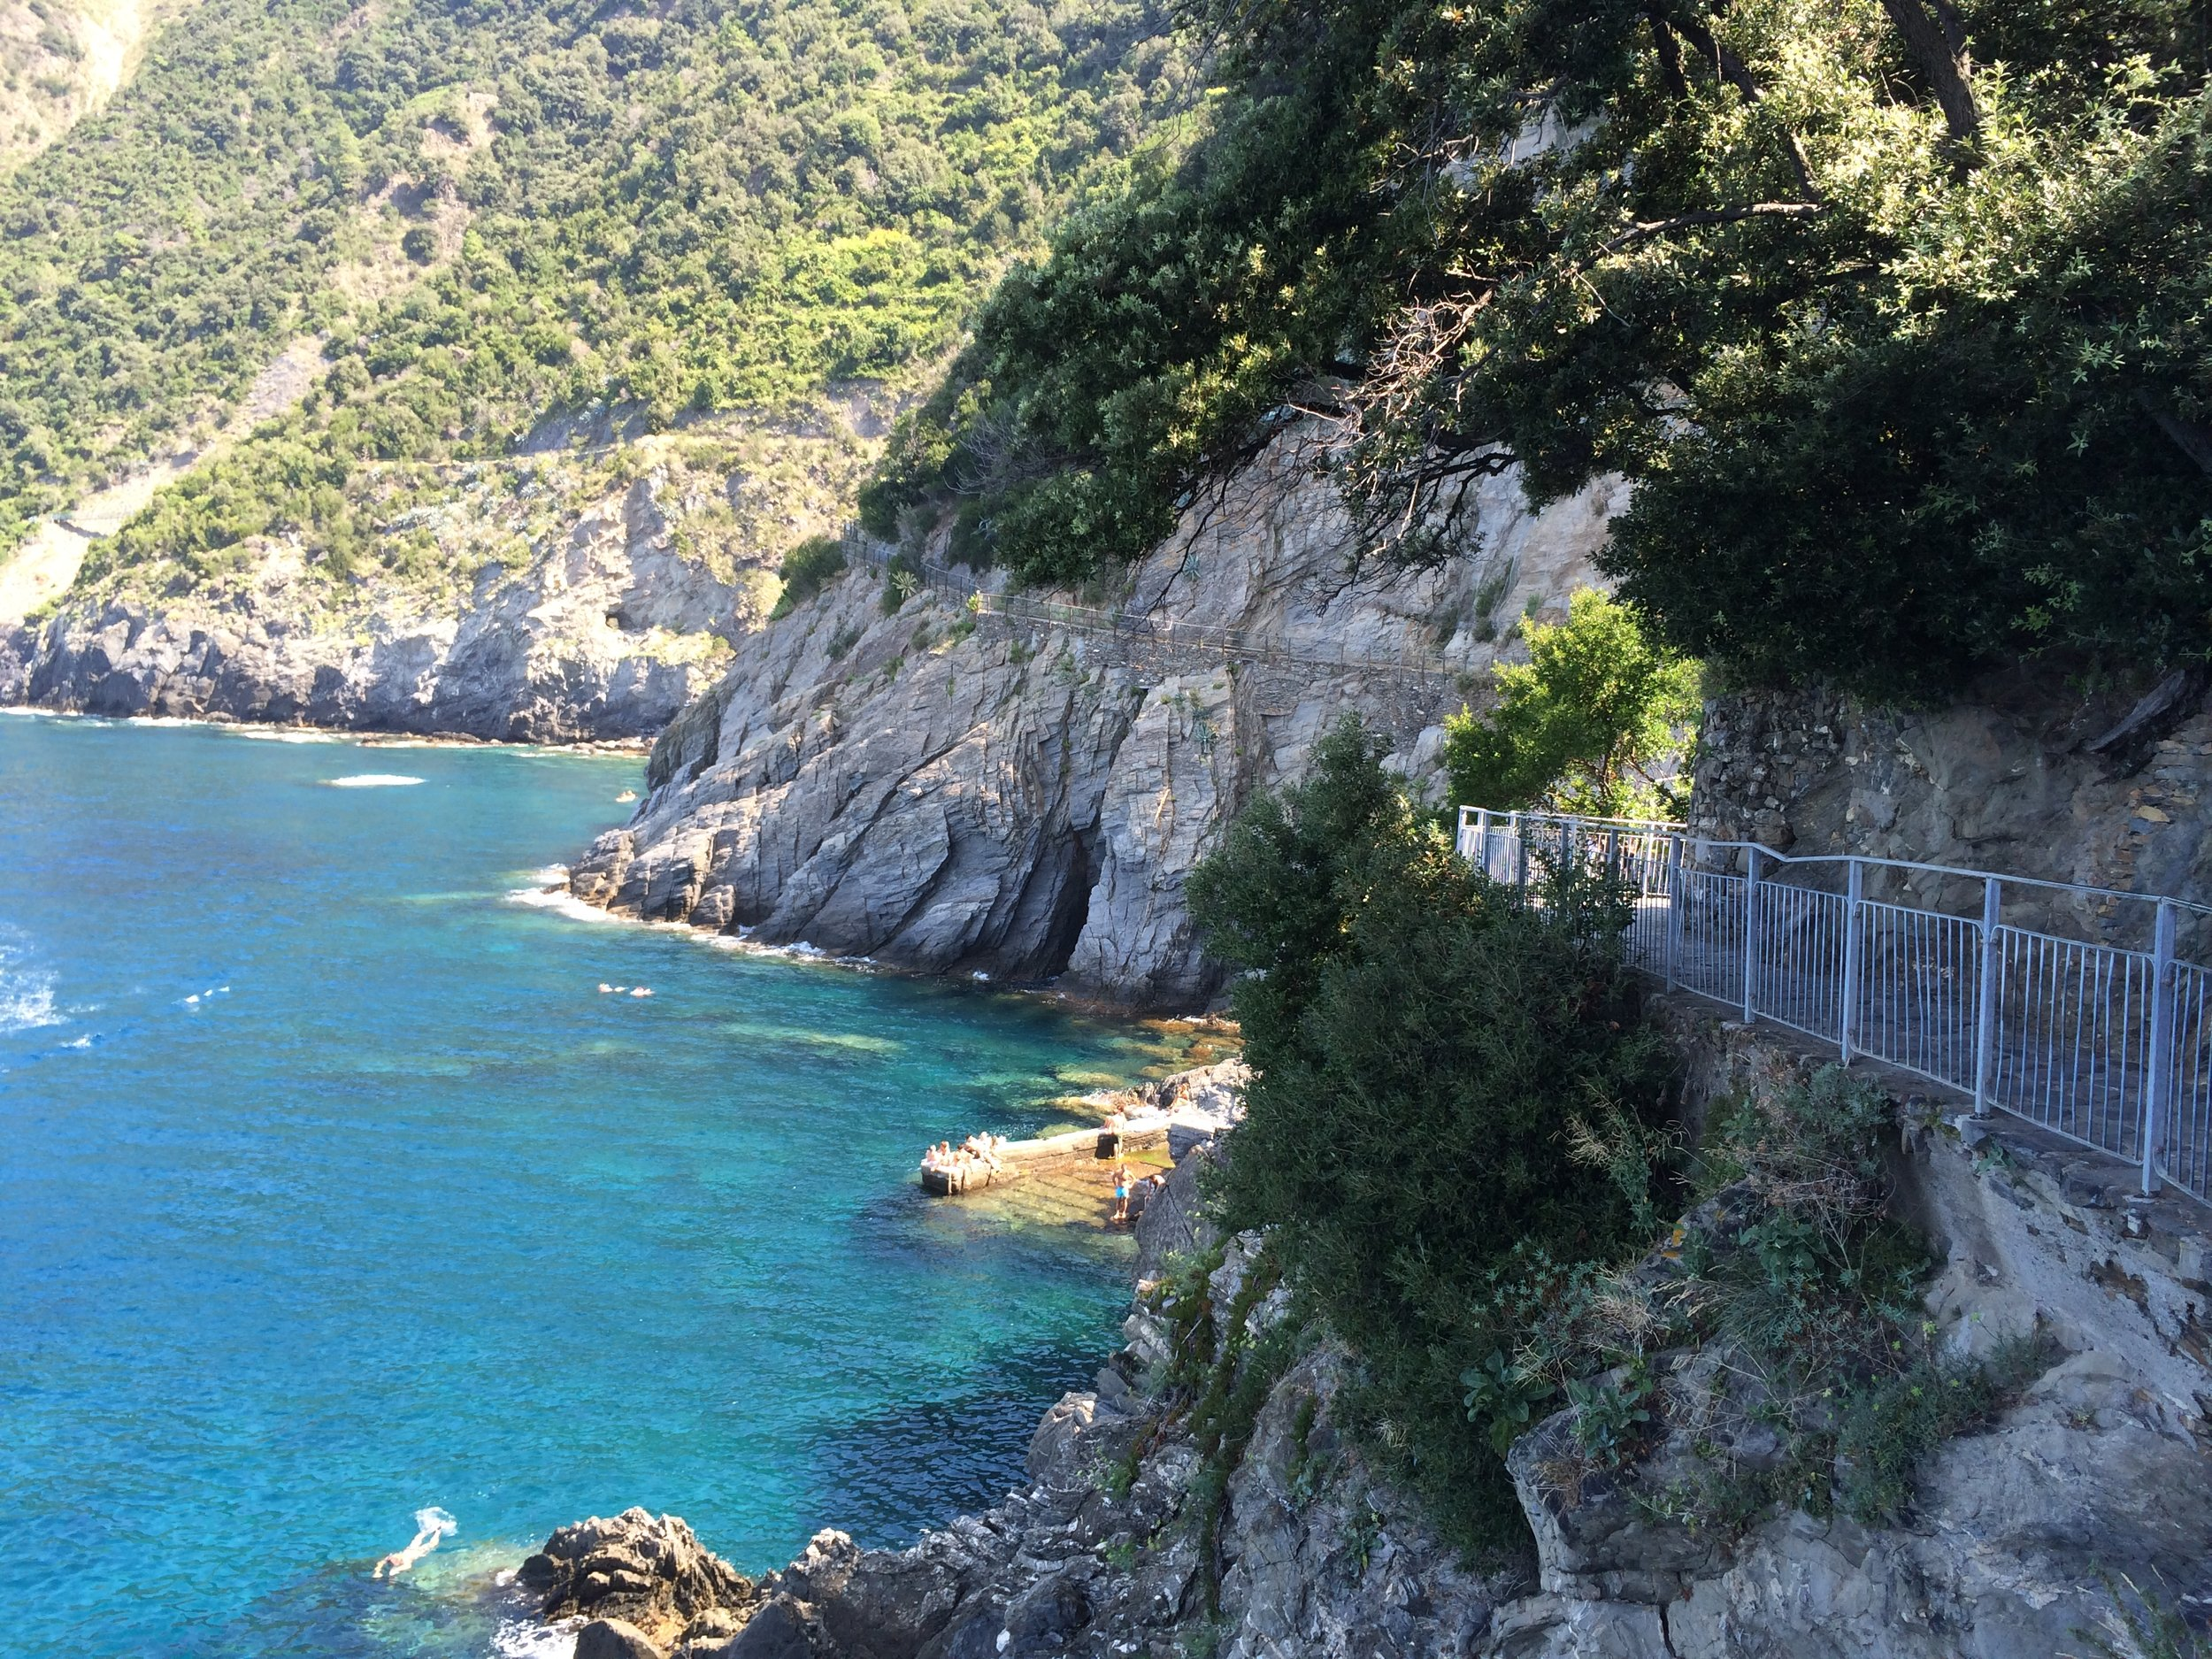 Coastal hiking trails